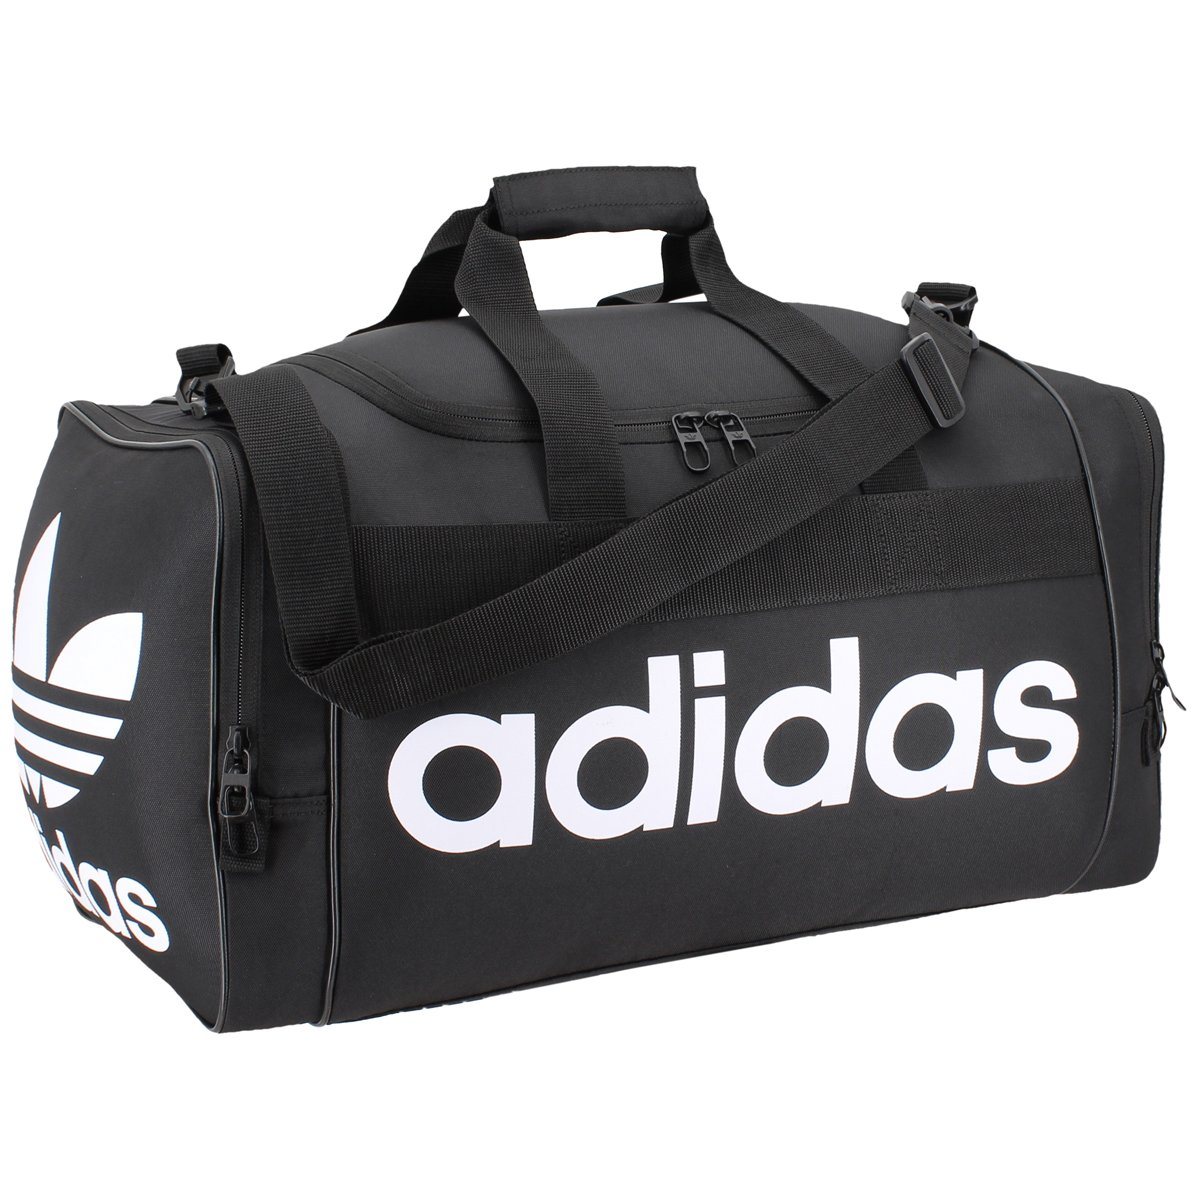 adidas Originals Santiago Duffel Bag, Black/White, One Size